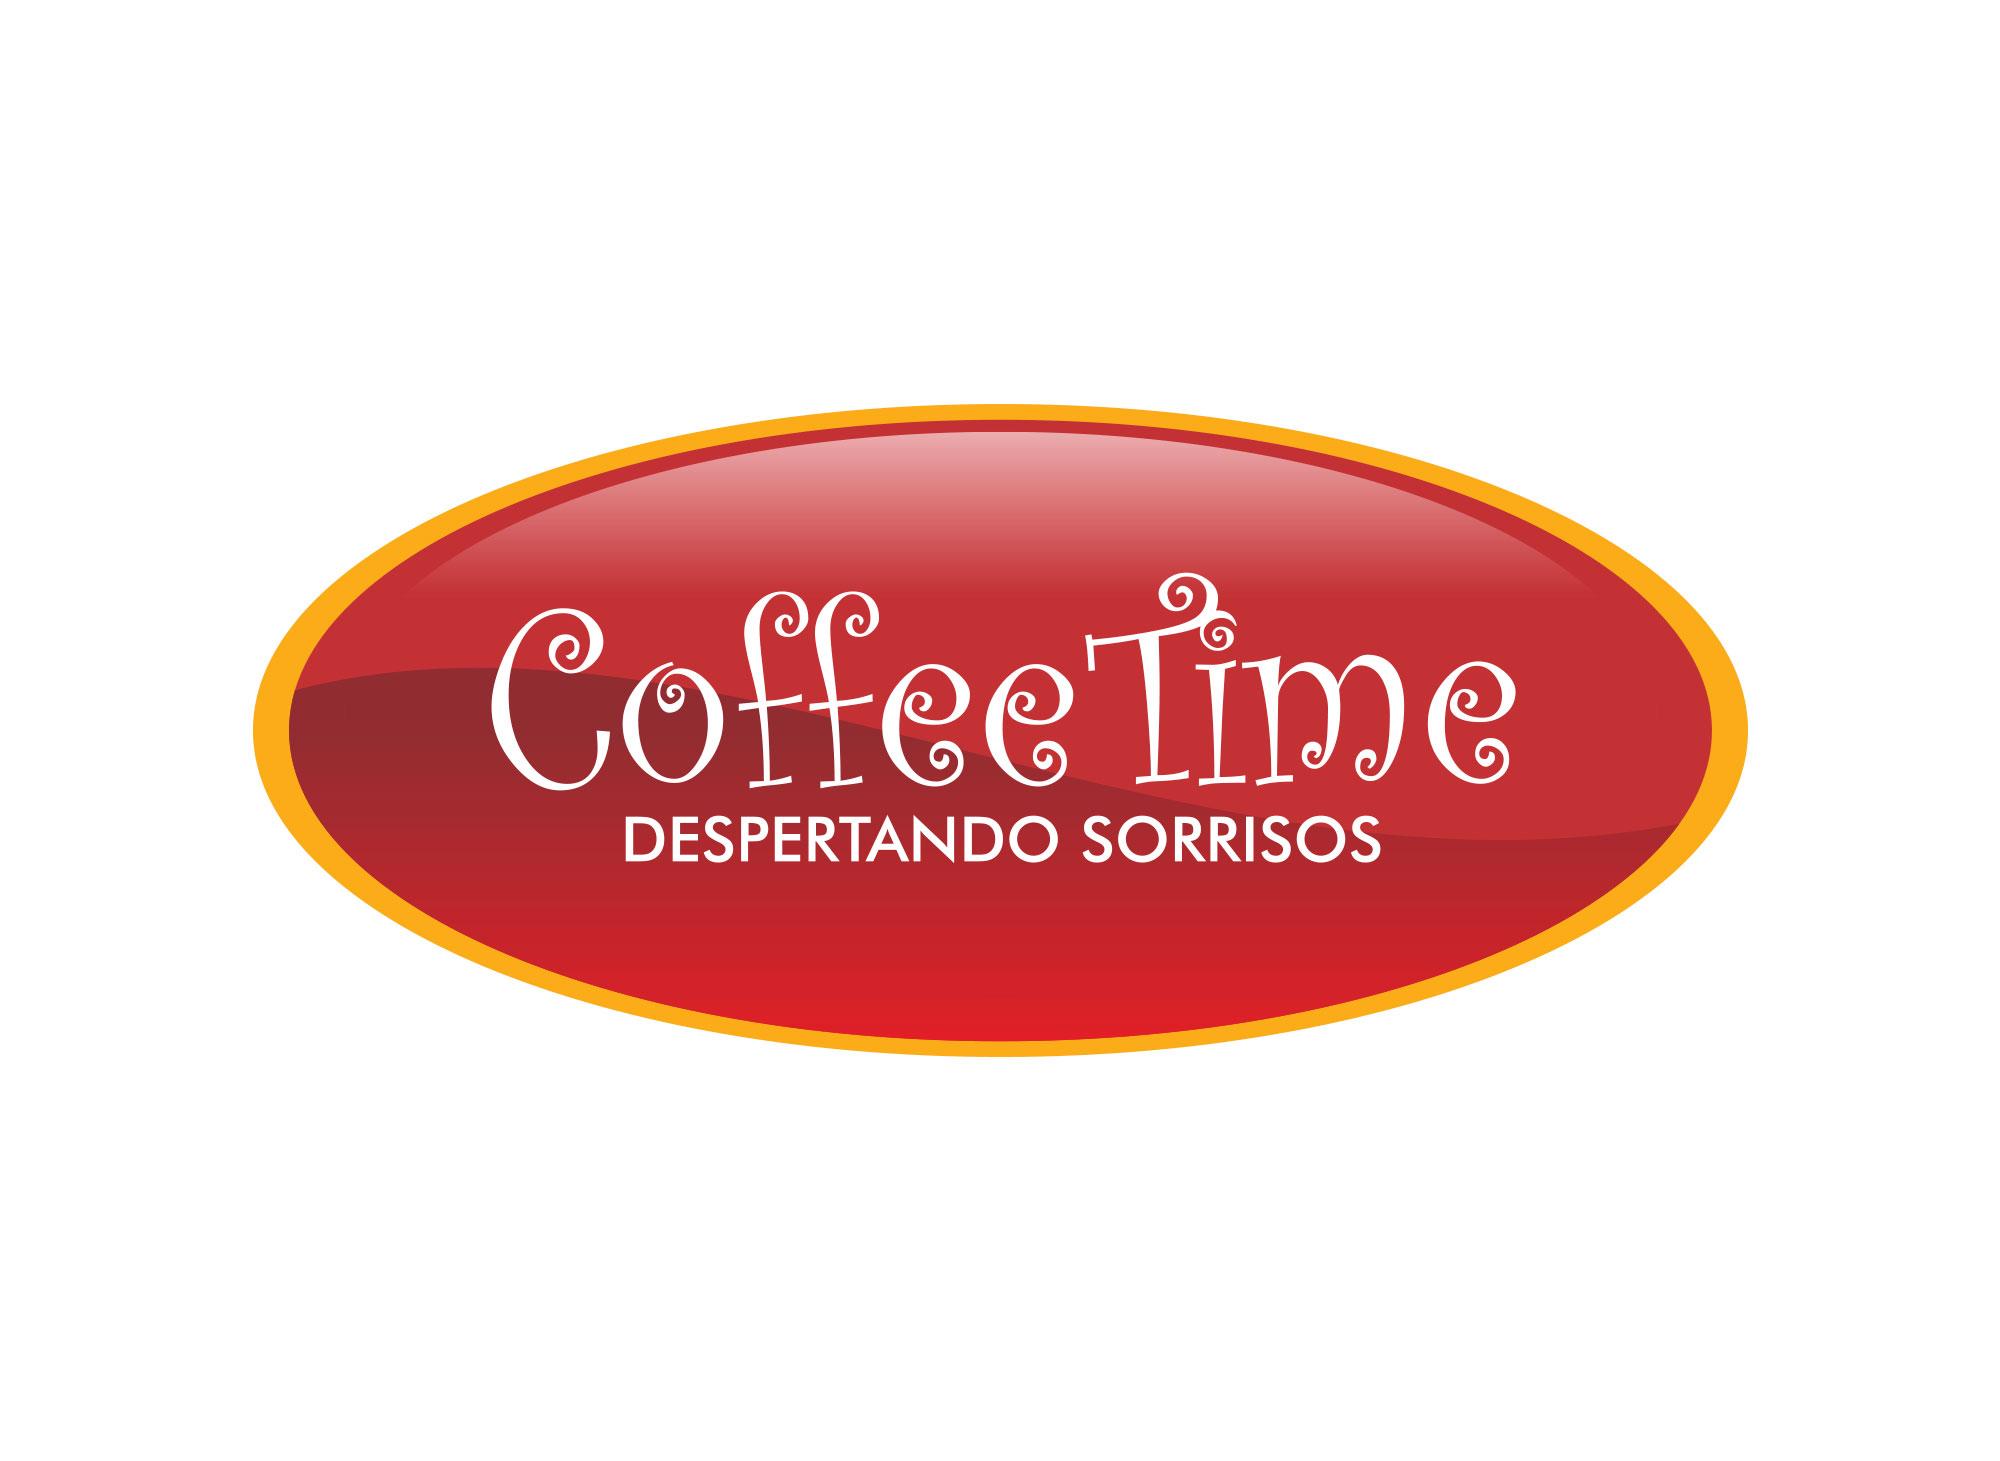 coffeetime-despertando-sonhos-cestas-clientes-agencia-diretriz-digital-marketing-loja-virtual-fortaleza